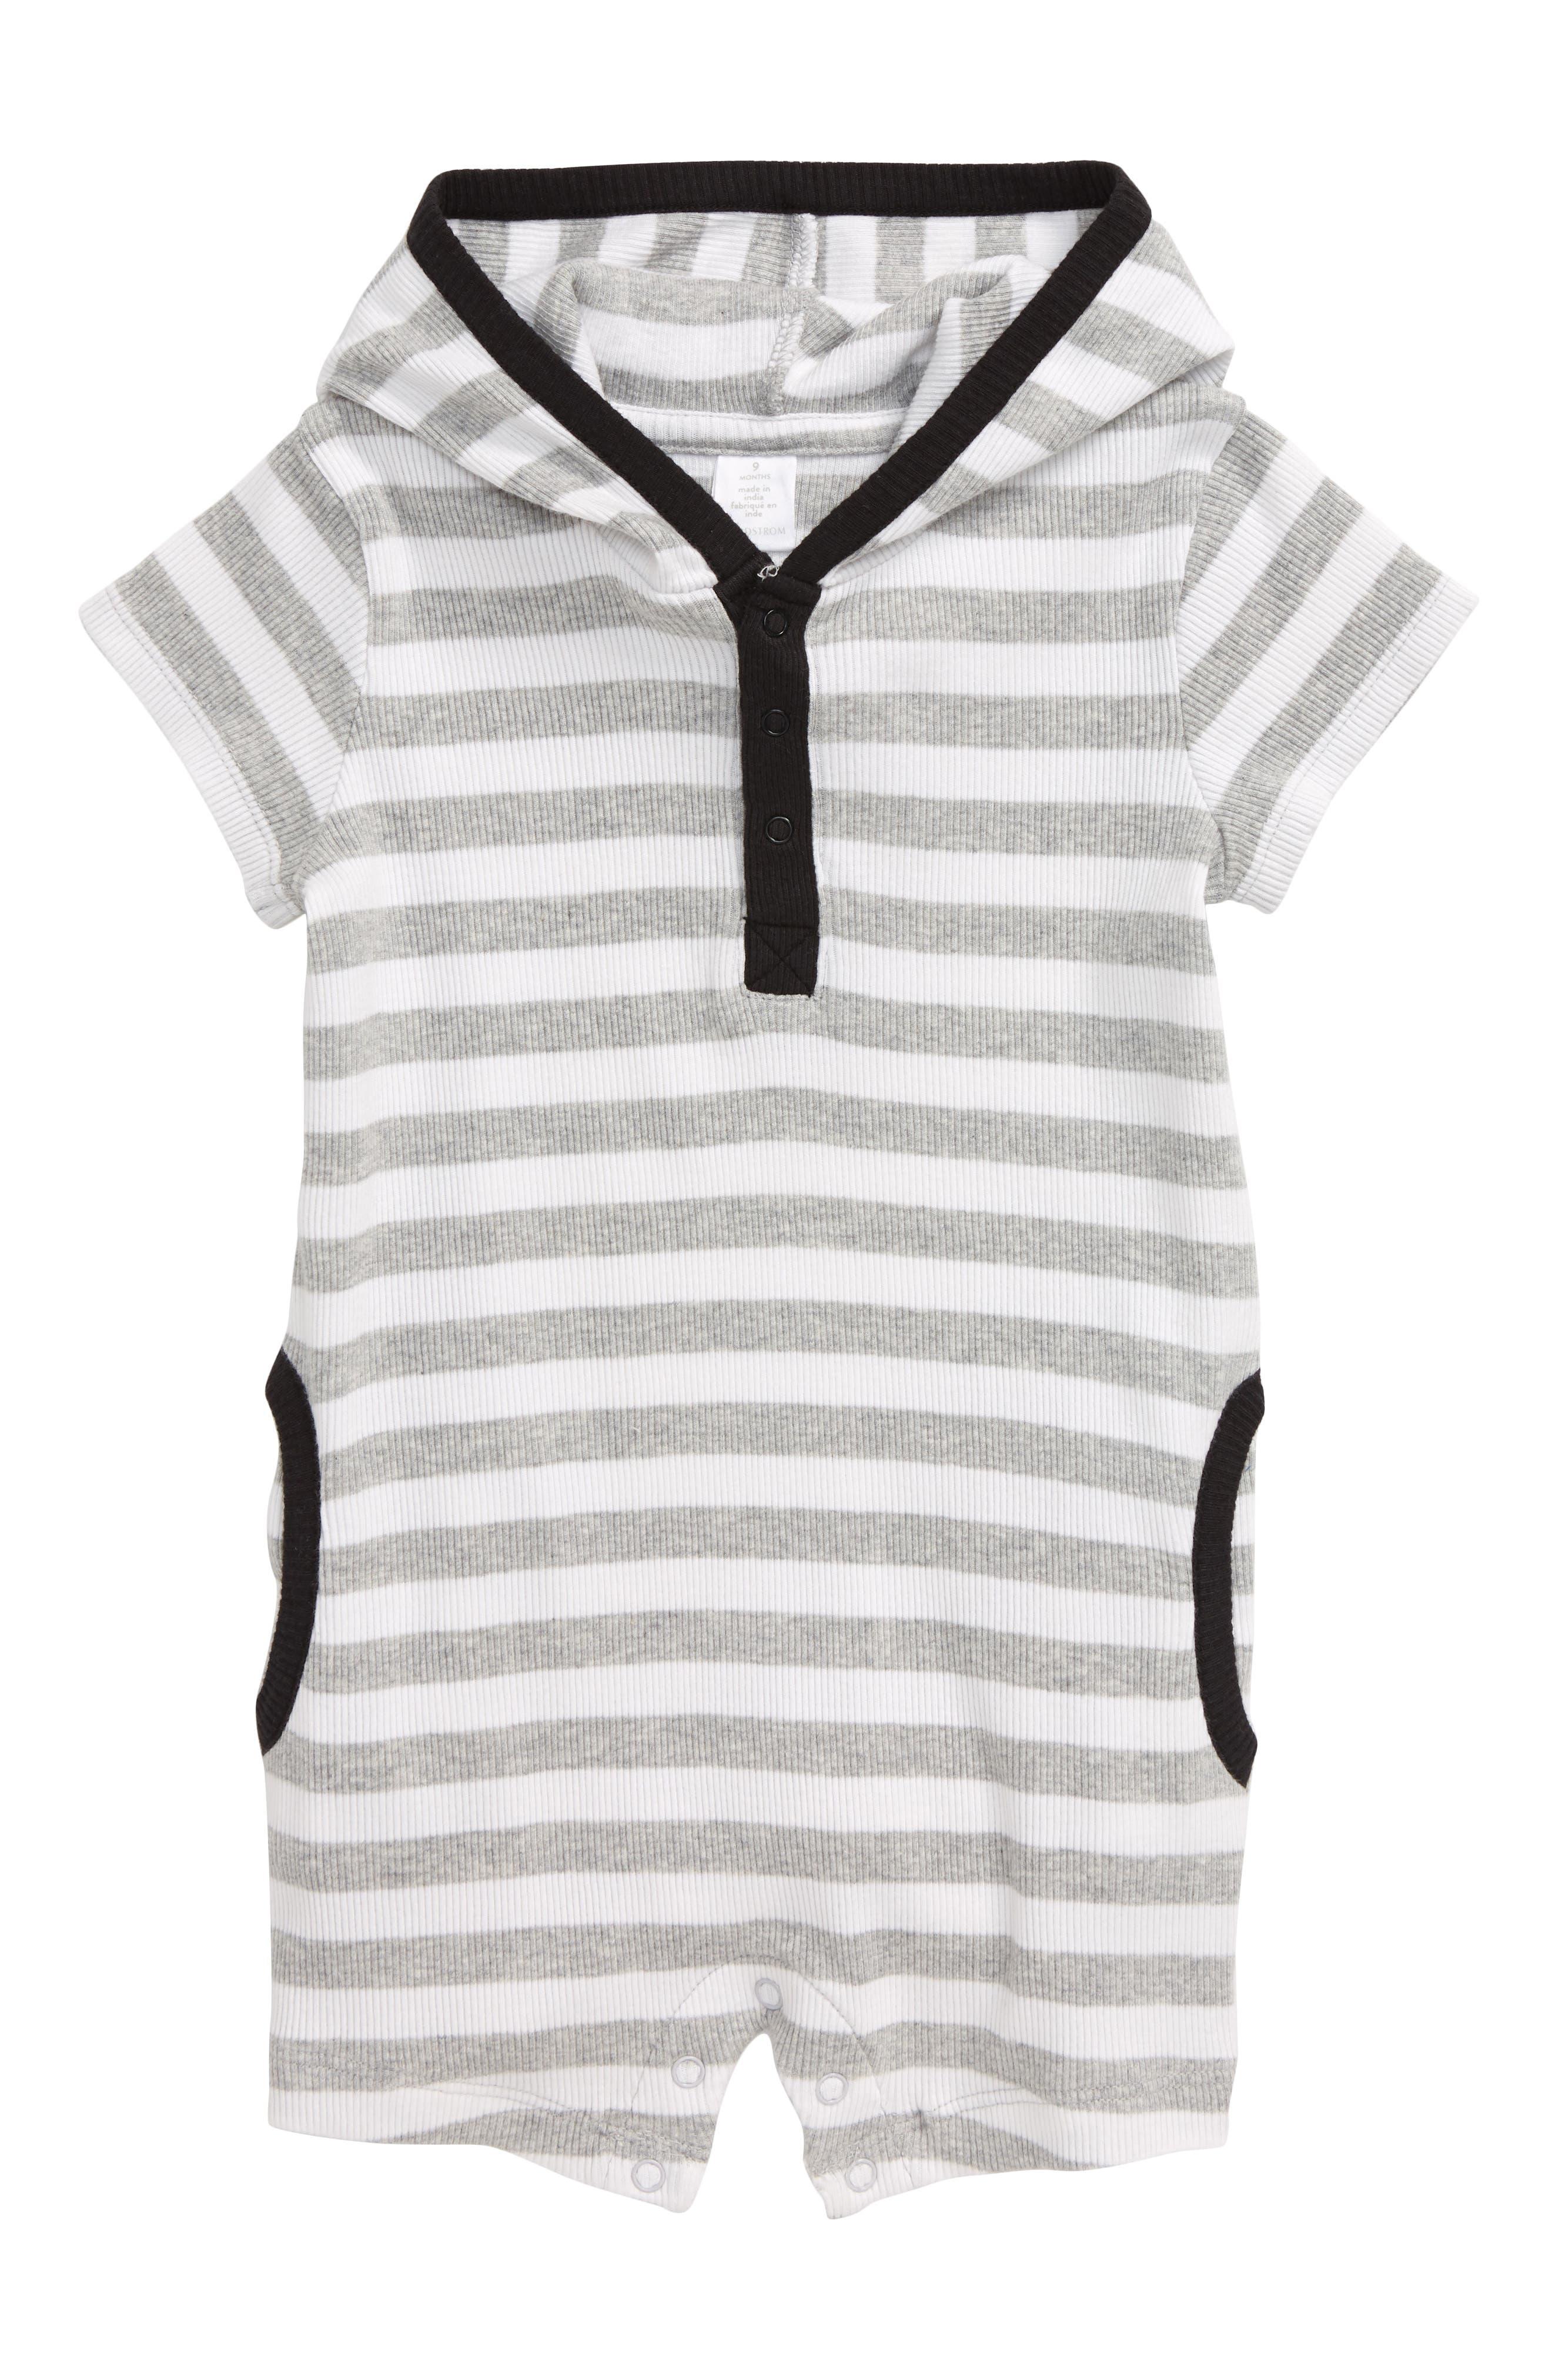 Image of Nordstrom Baby Heathered Stripe Hooded Henley Romper